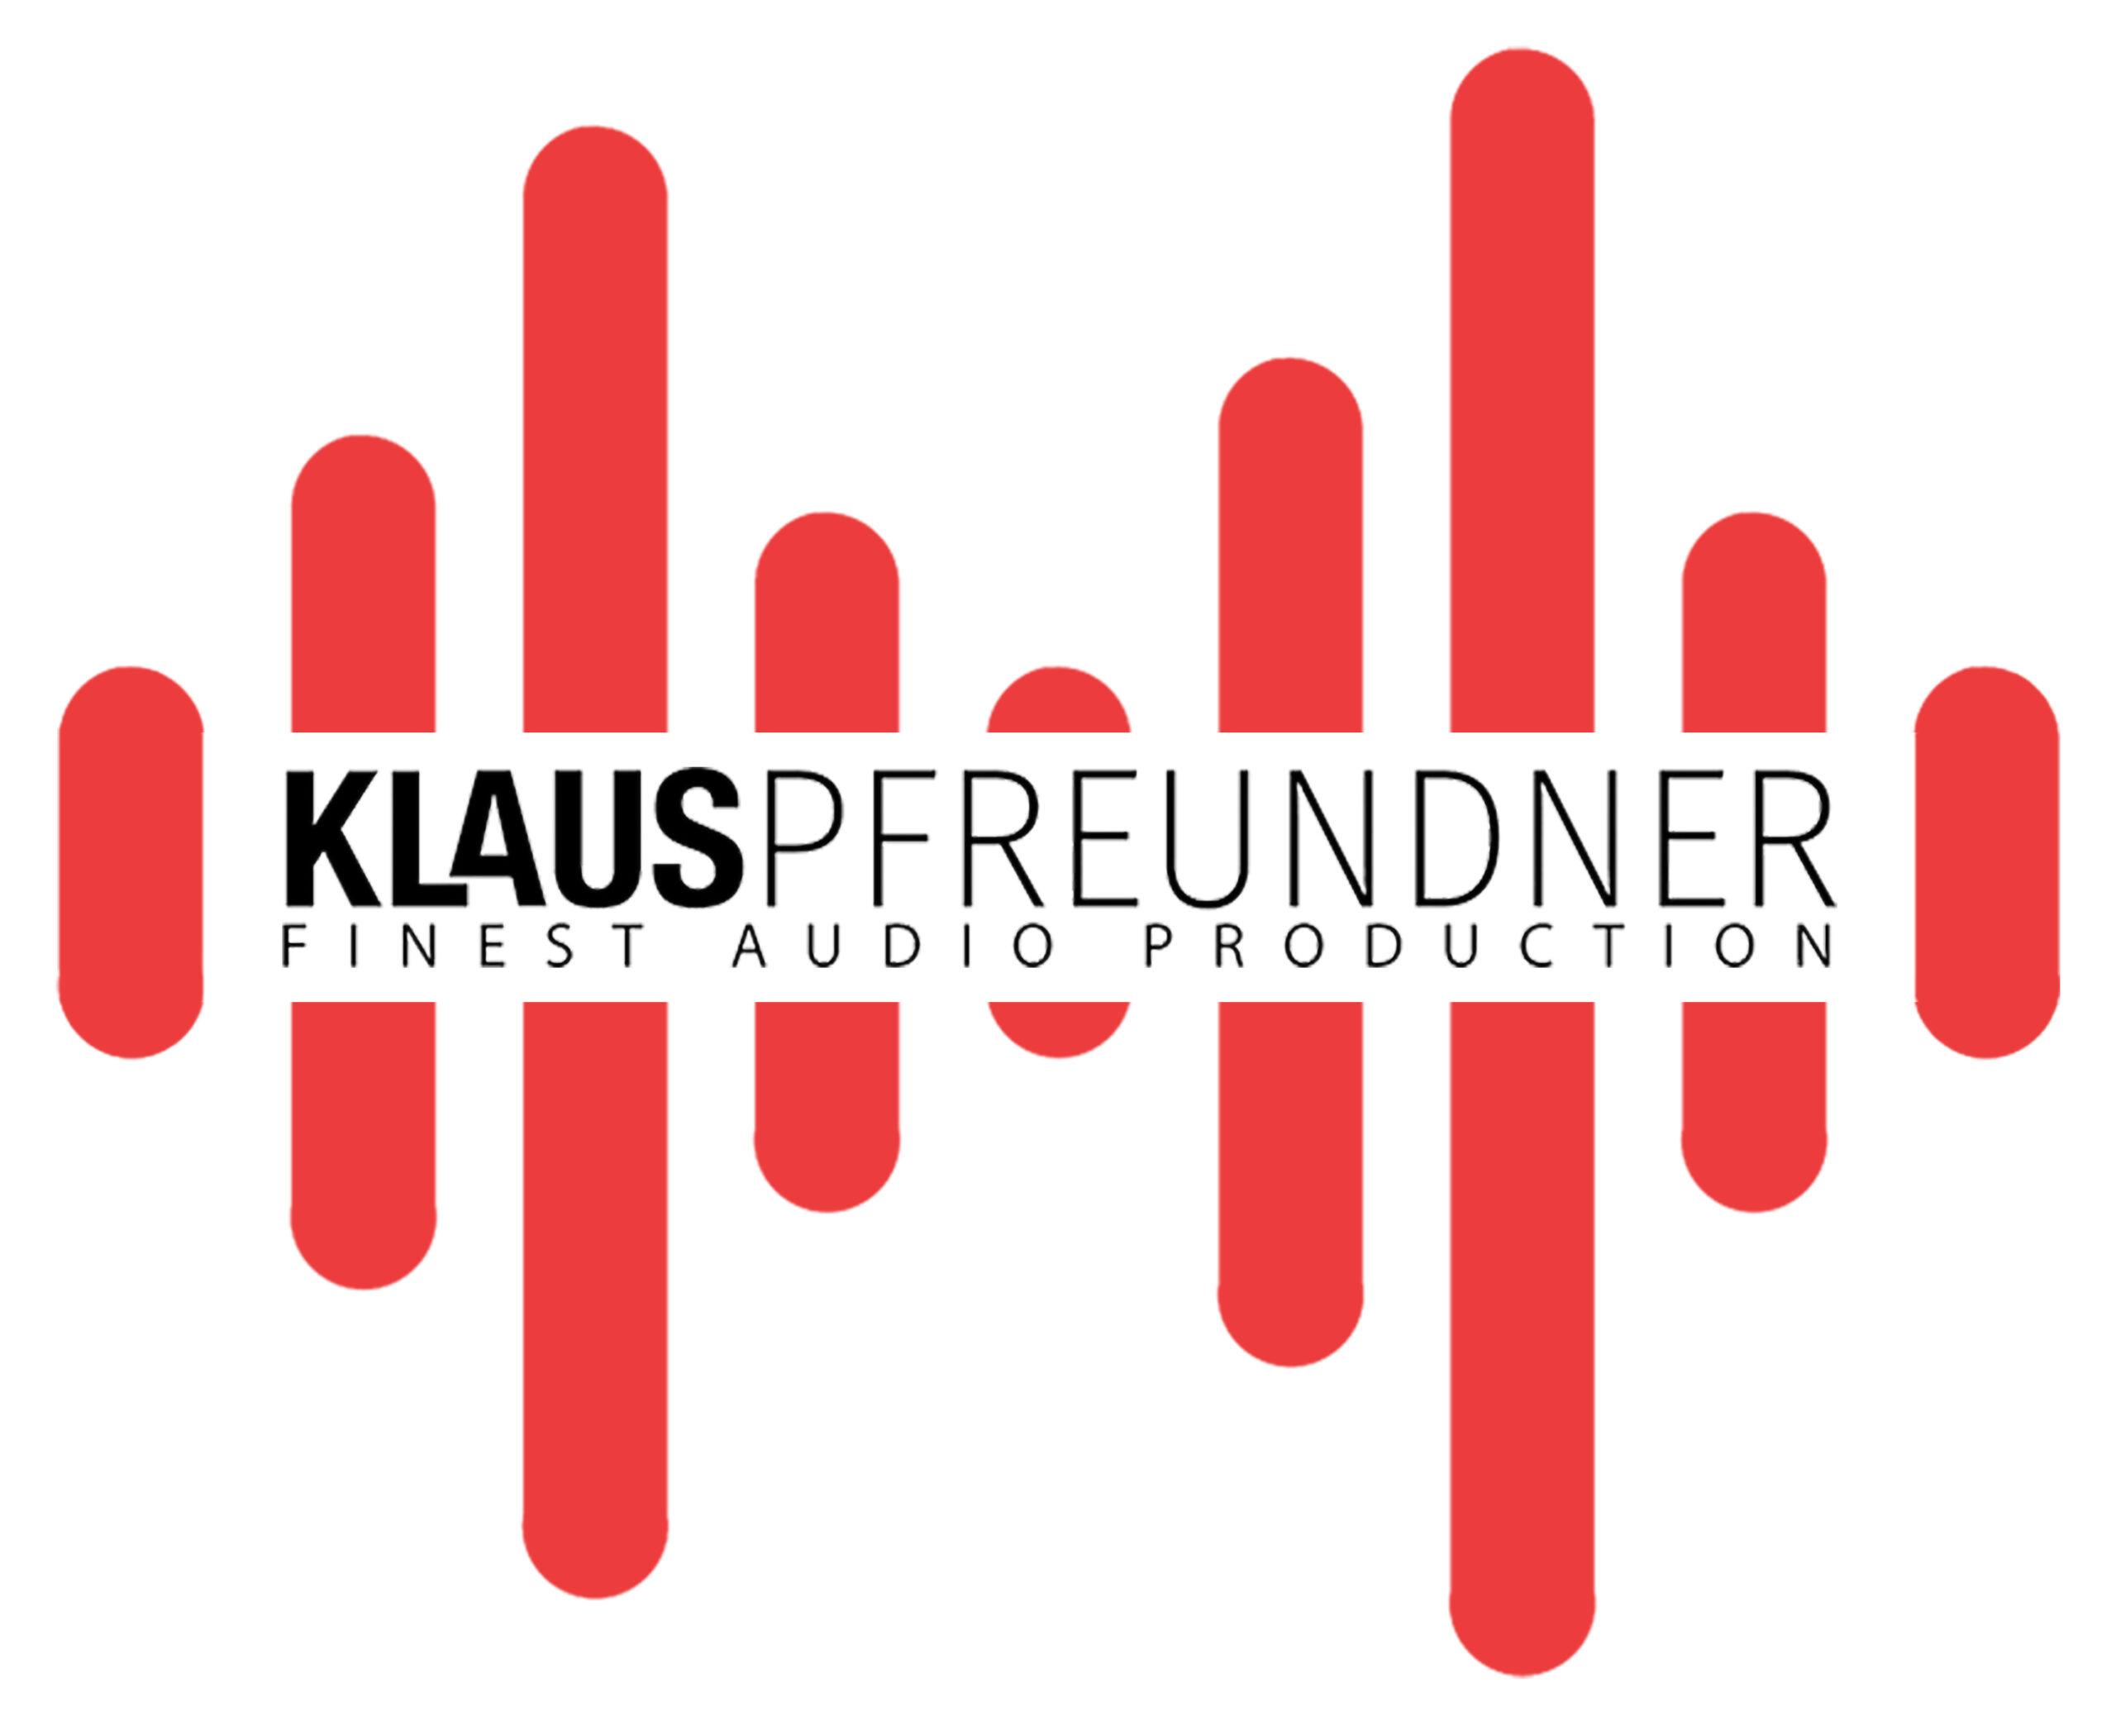 Klaus Pfreundner